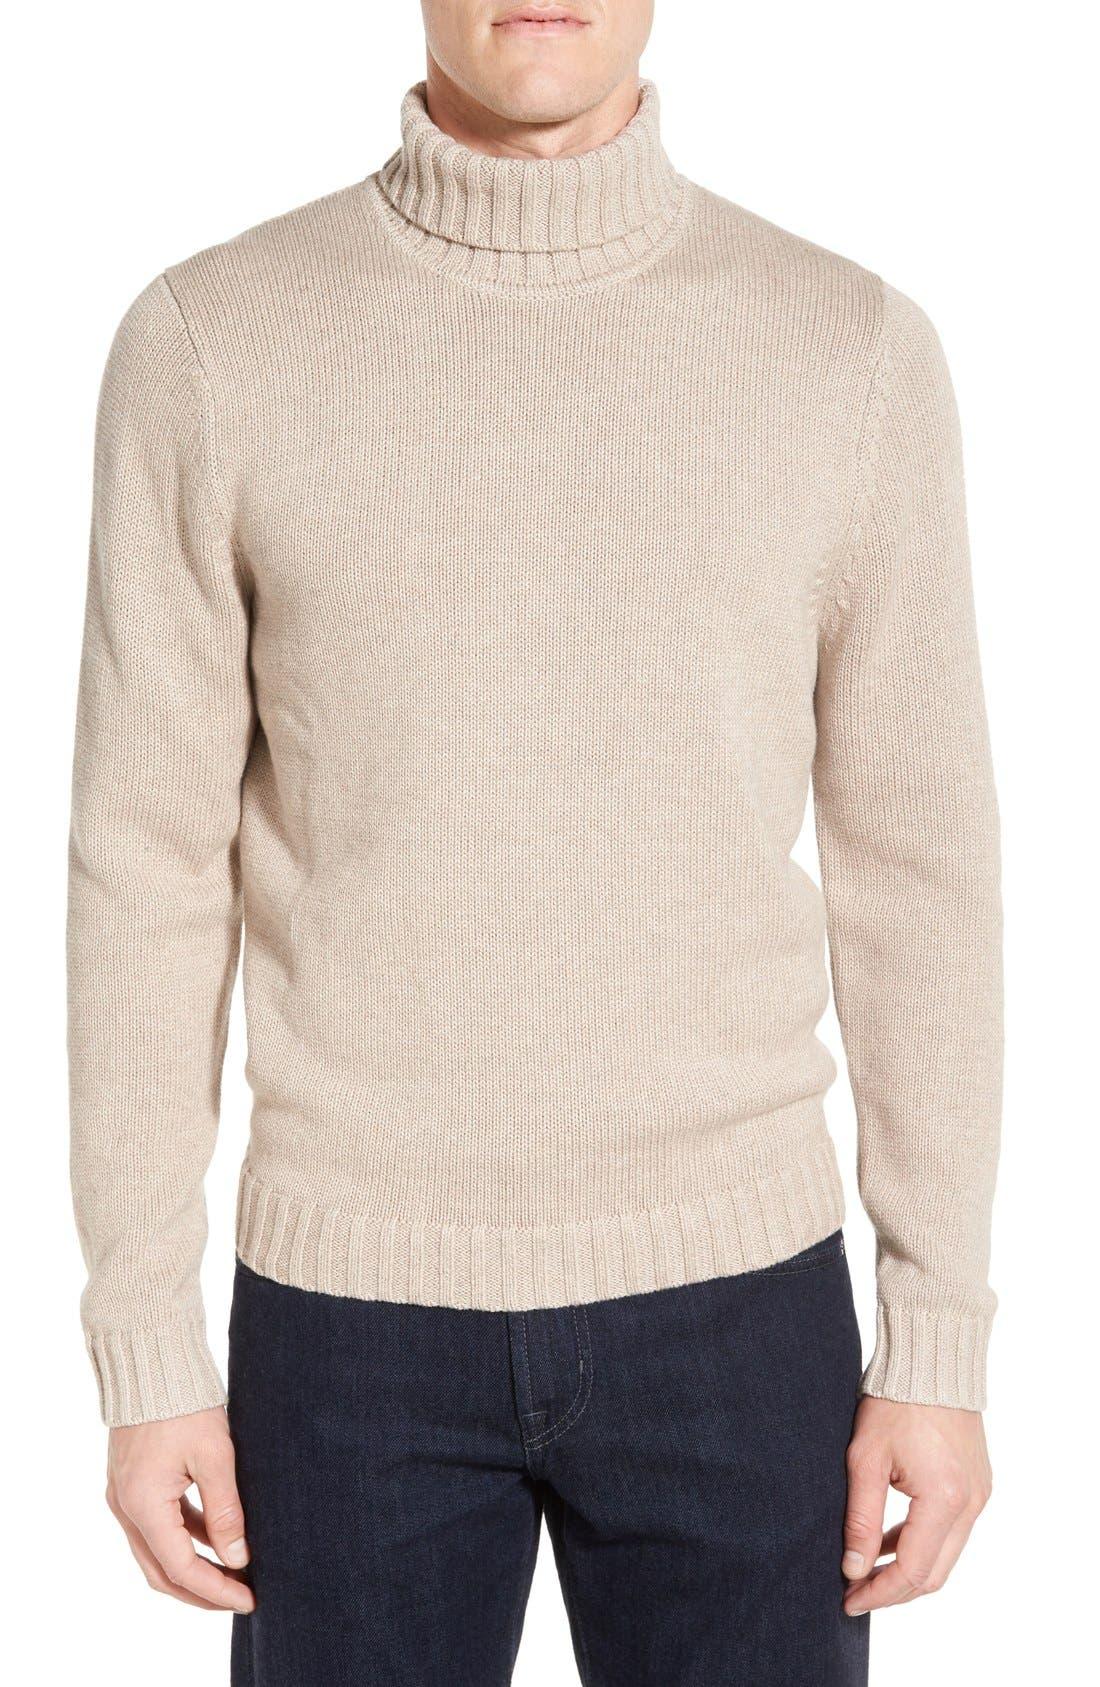 Alternate Image 1 Selected - Nordstrom Men's Shop Chunky Turtleneck Sweater (Regular & Tall)